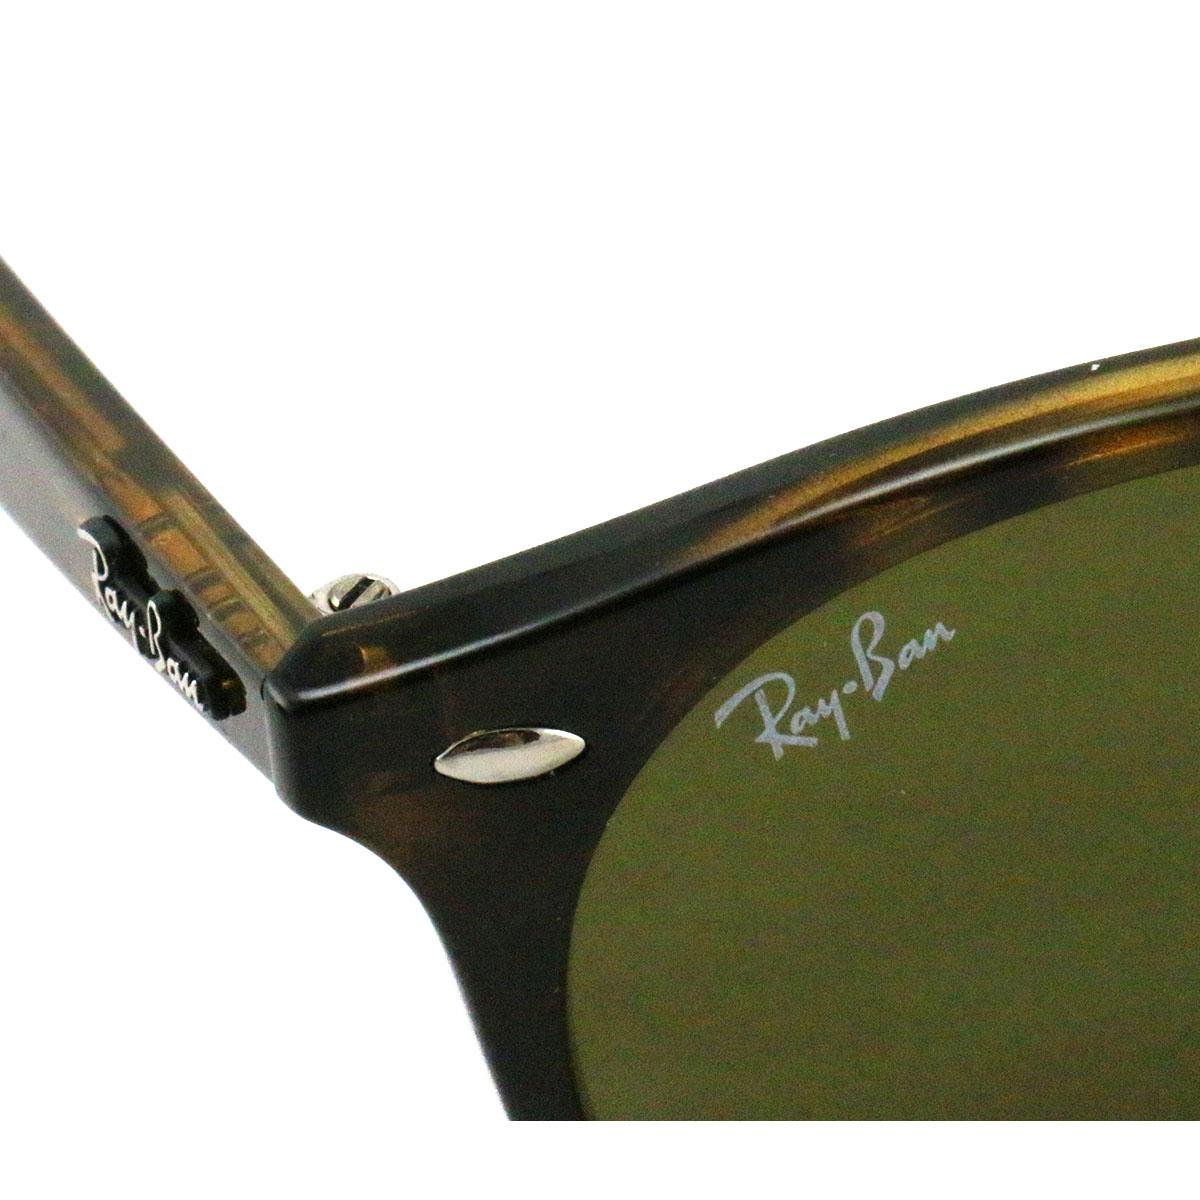 89dfe1beee555 Description. Ray-Ban Injected Sunglasses RB4279 Shiny Havana Non-Polarized  51 21 150. Specification